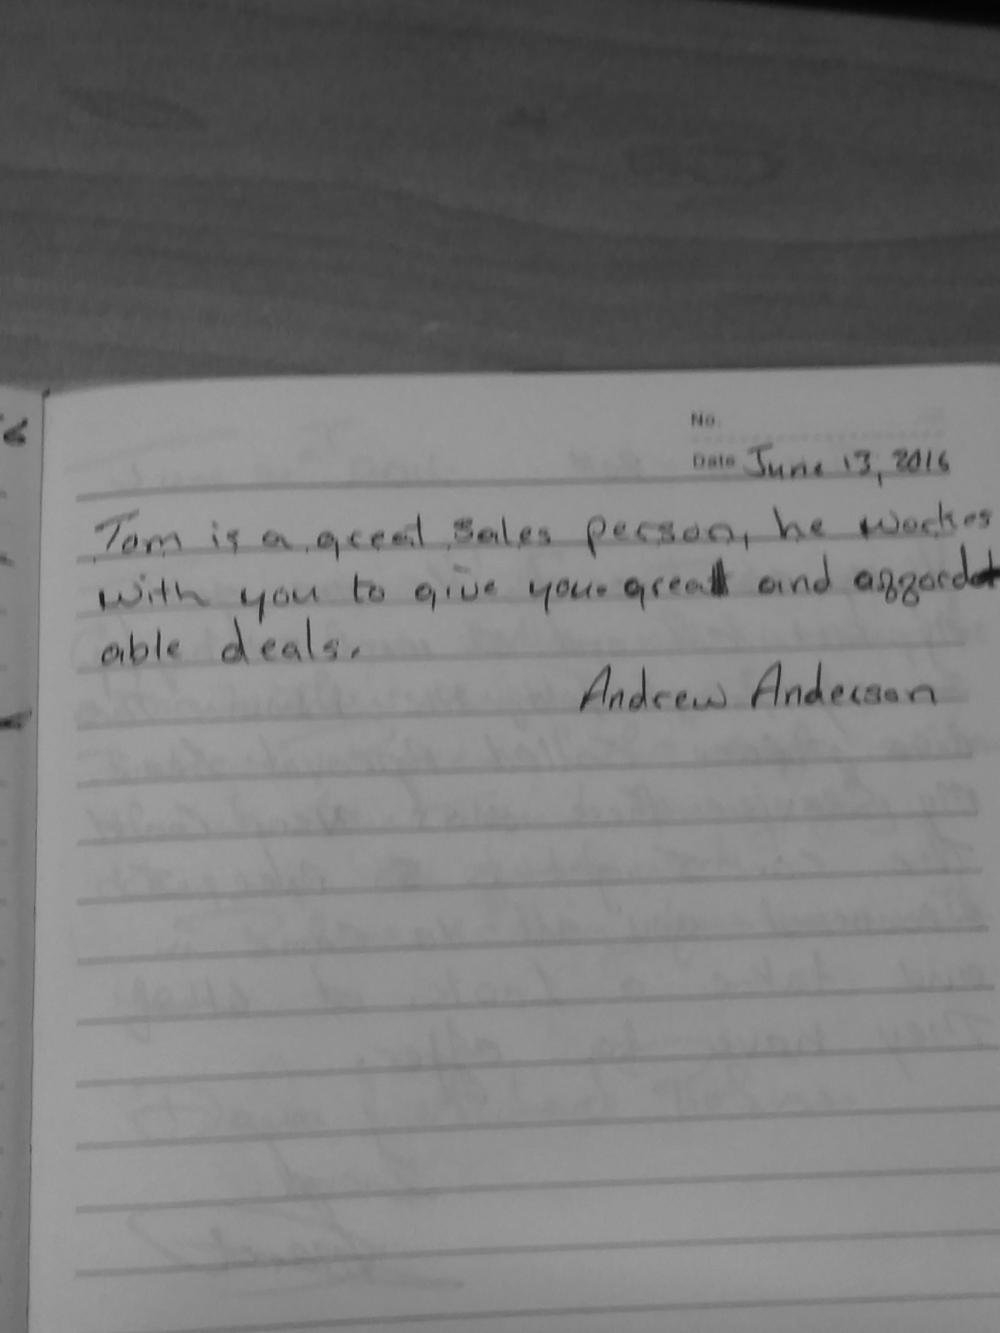 Andrew Anderson_Testimonial.jpg